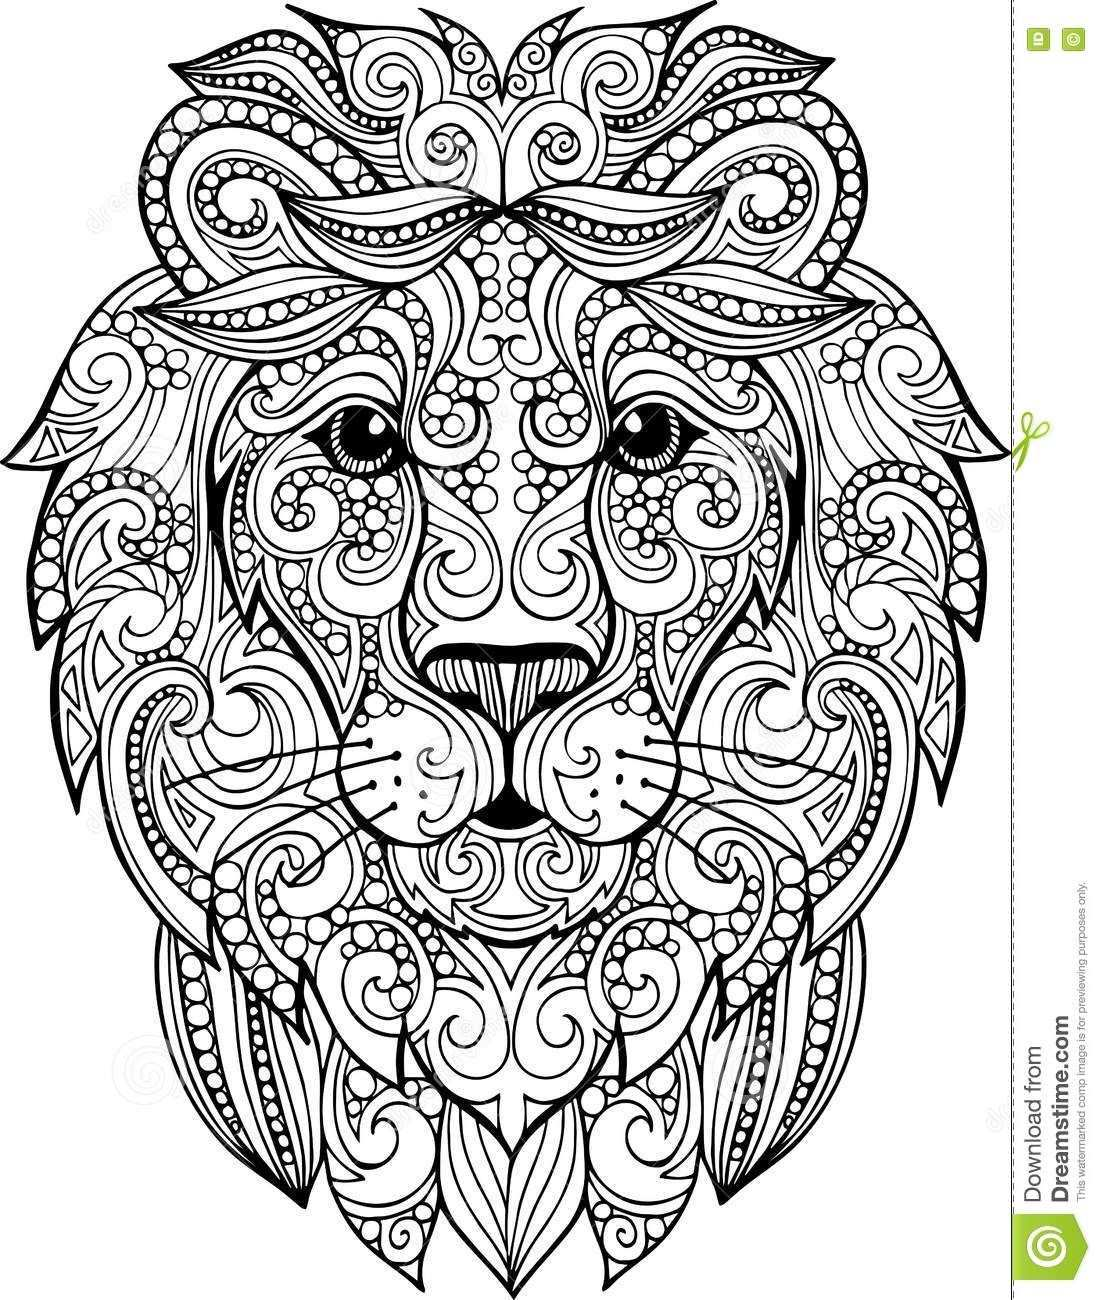 Gerelateerde Afbeelding Kleurplaten Adult Coloring Pages